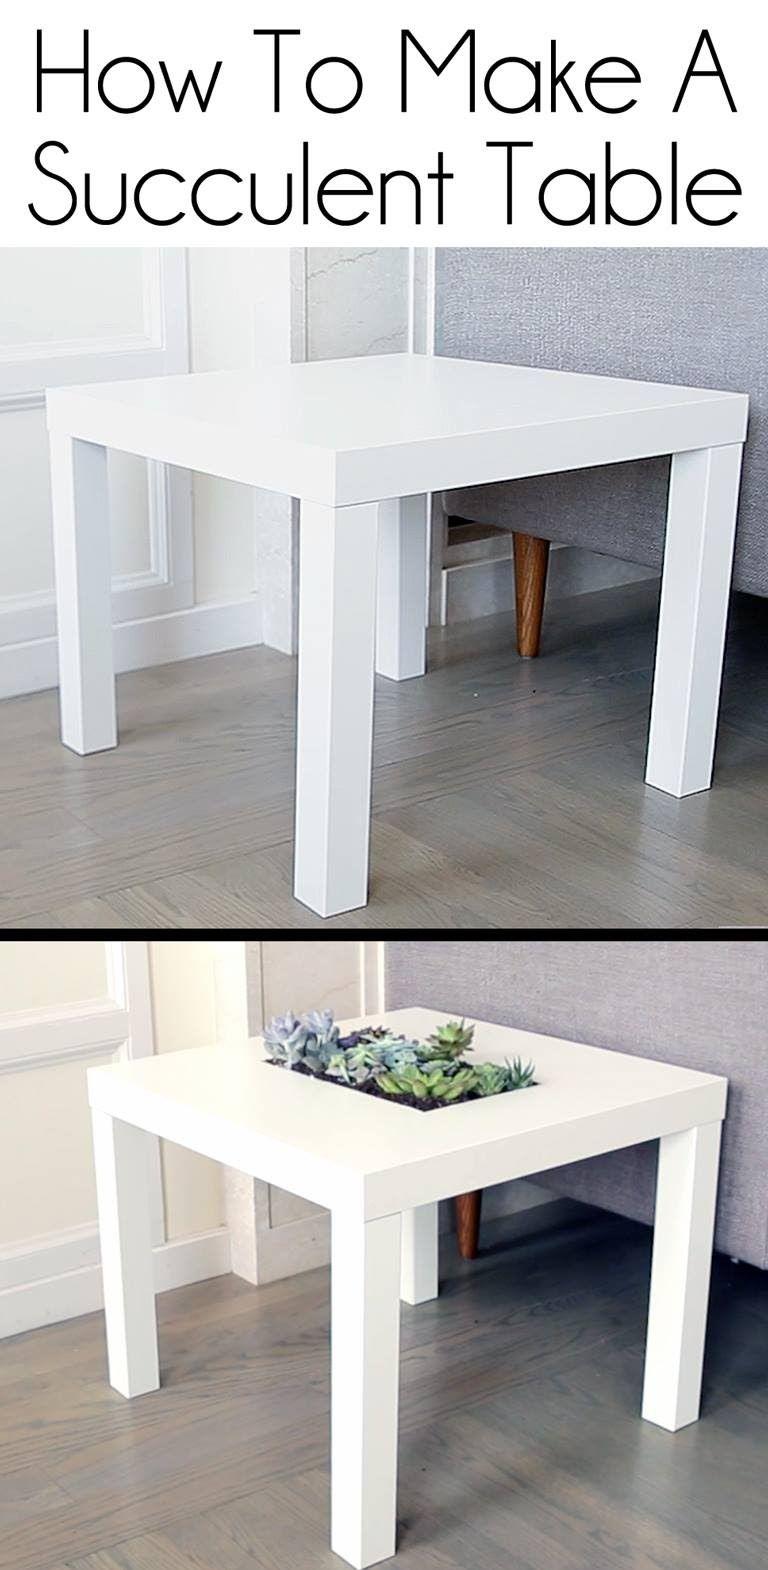 Ikea, Une Table Avec Des Plantes Diy | Table Ikea, Table ... tout Table Basse De Jardin Ikea